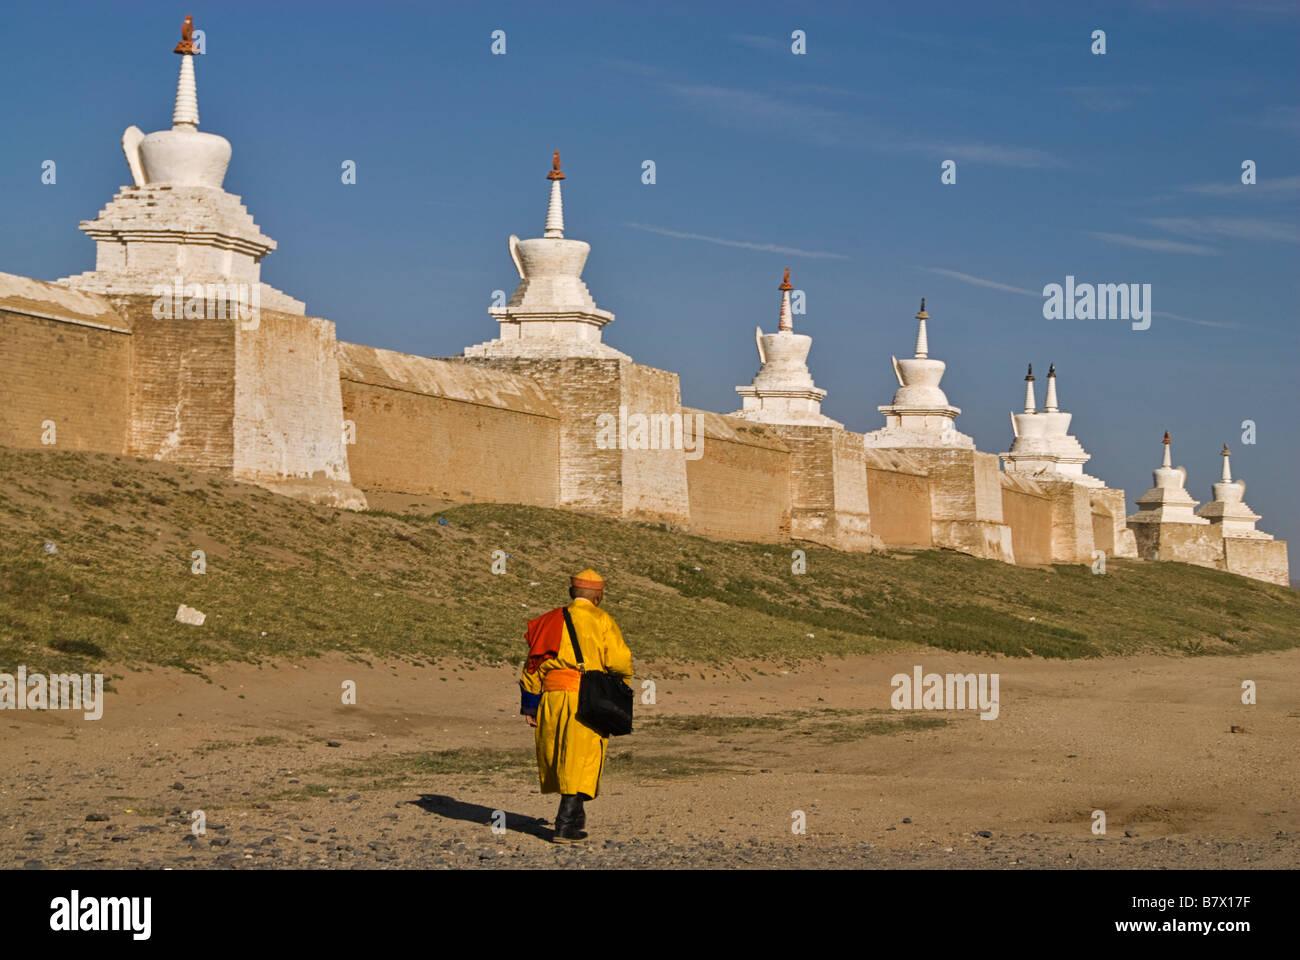 Buddhist monk nearby Erdene Zuu Khiid monastery Kharkhorin Karakorum Mongolia - Stock Image